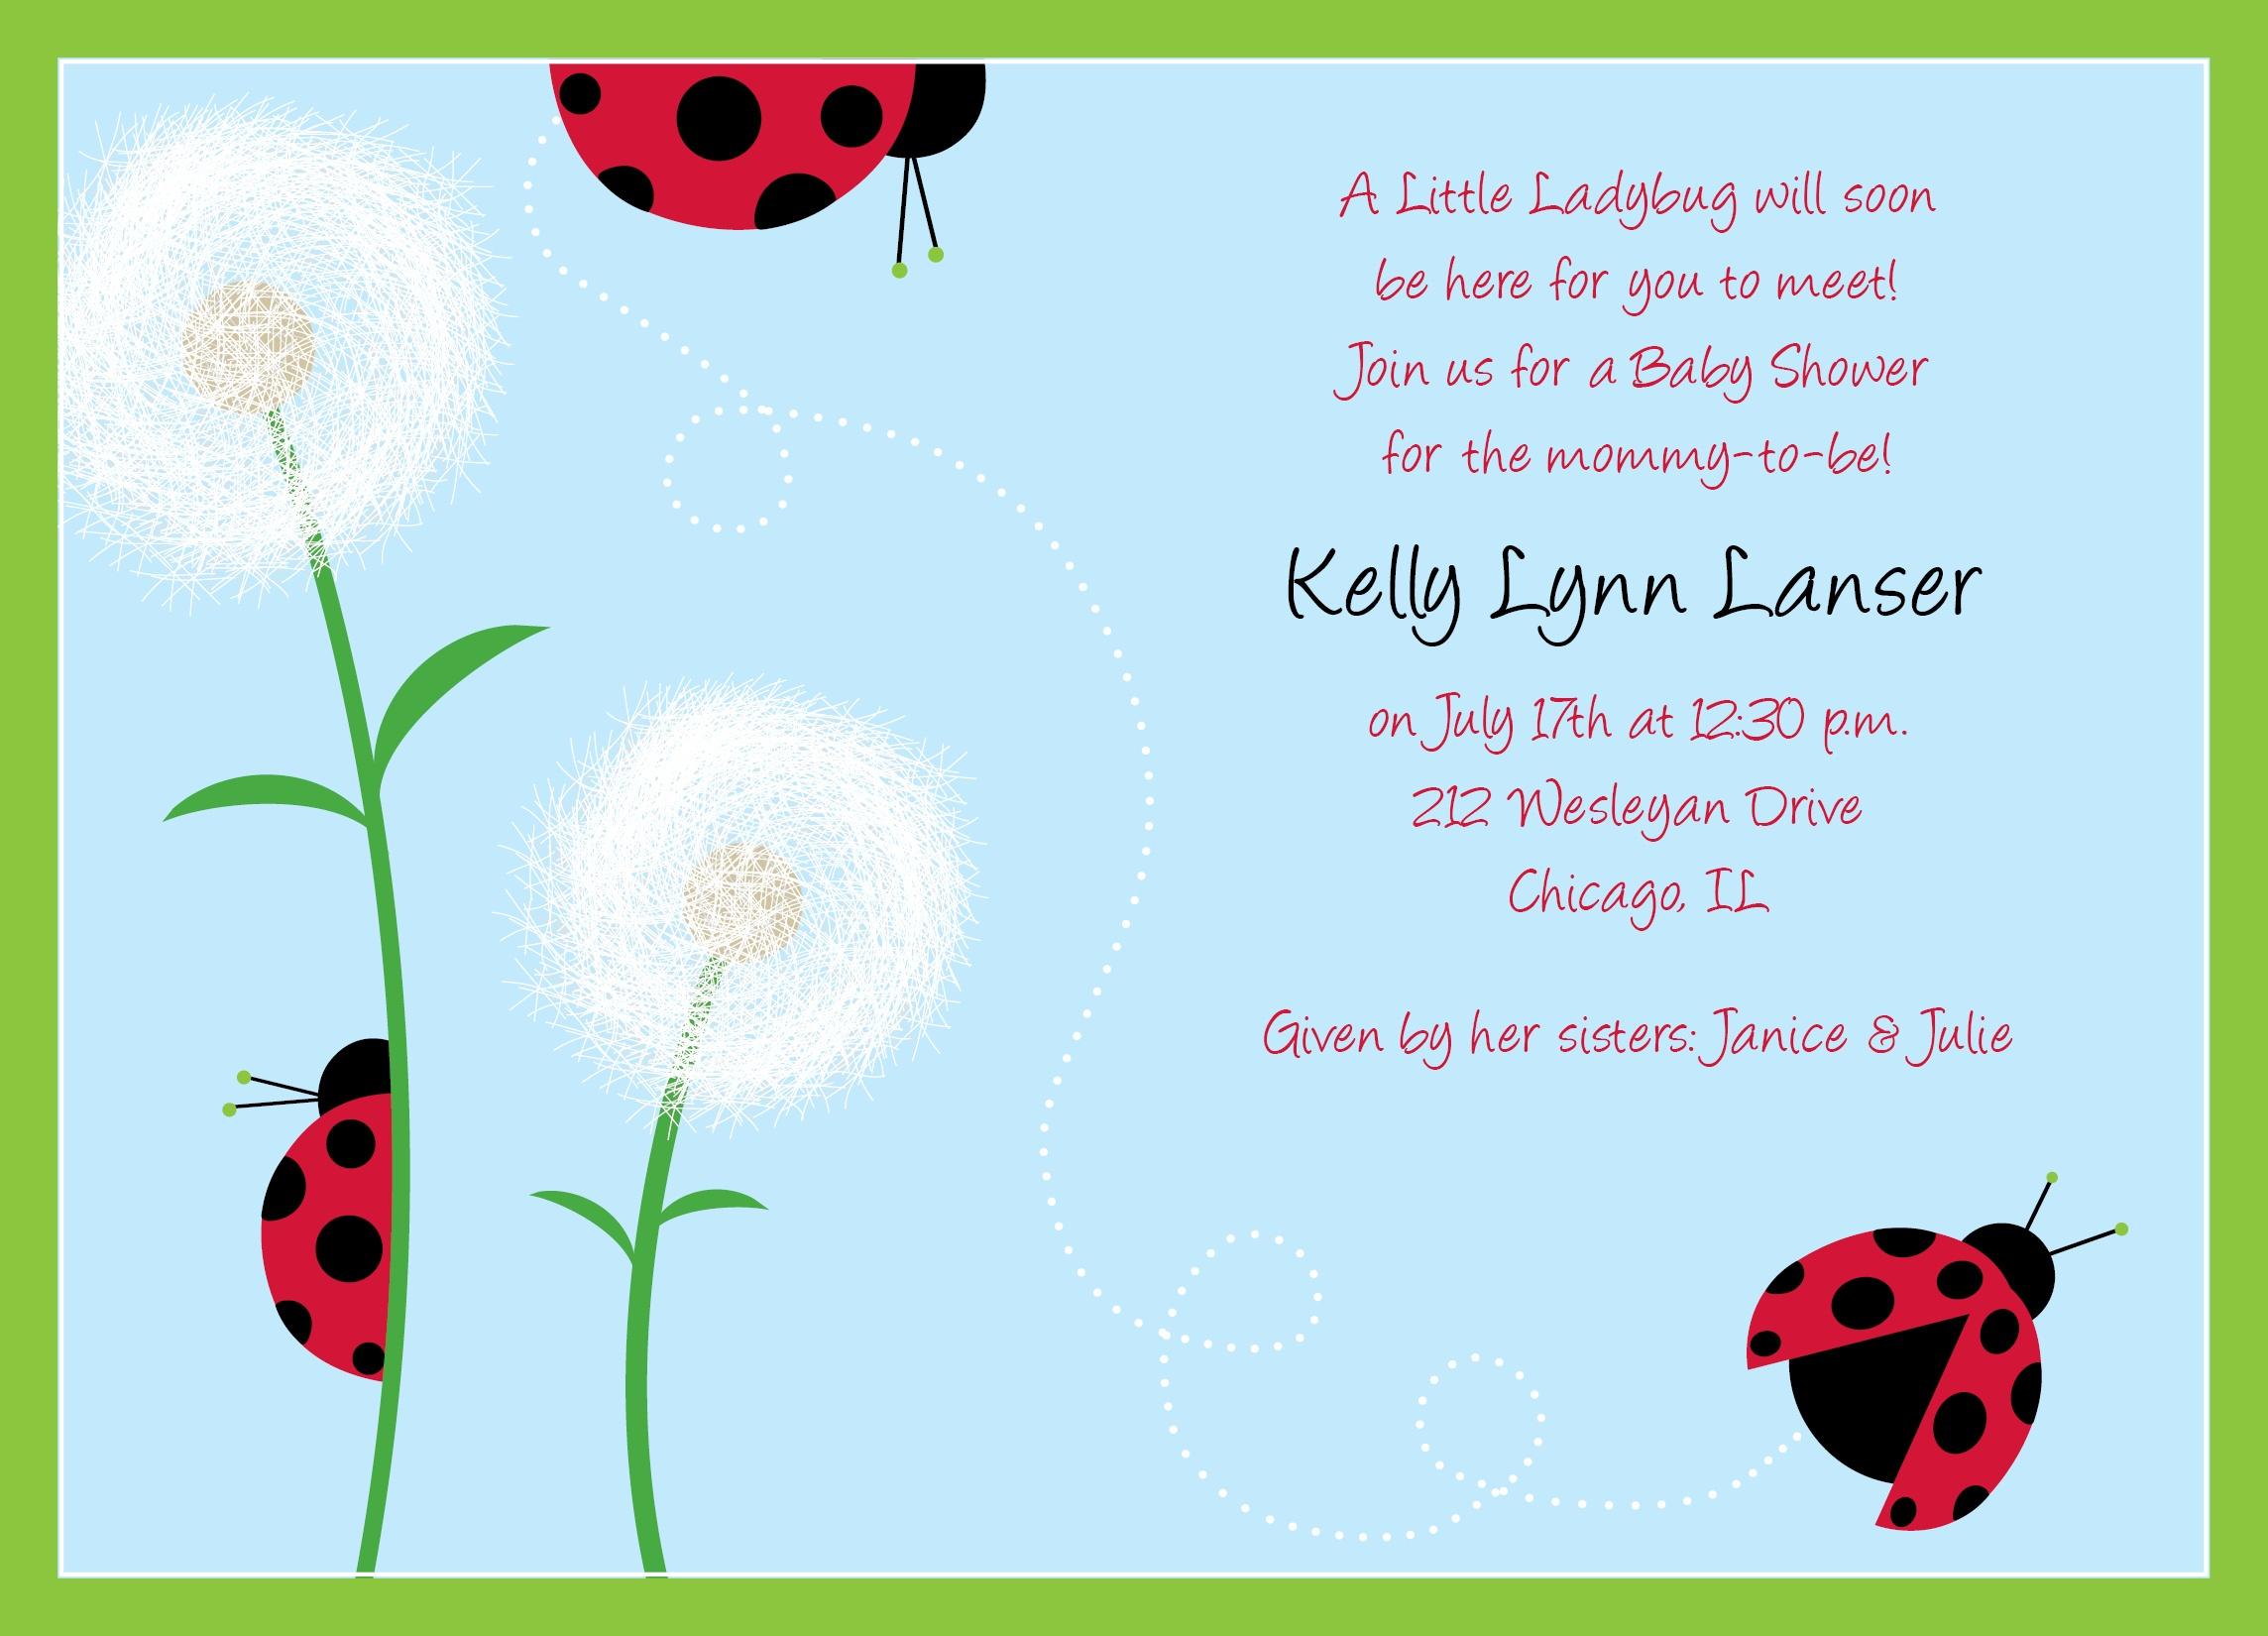 Photo : Nw Rlp 443 Jpg Image - Free Printable Ladybug Baby Shower Invitations Templates